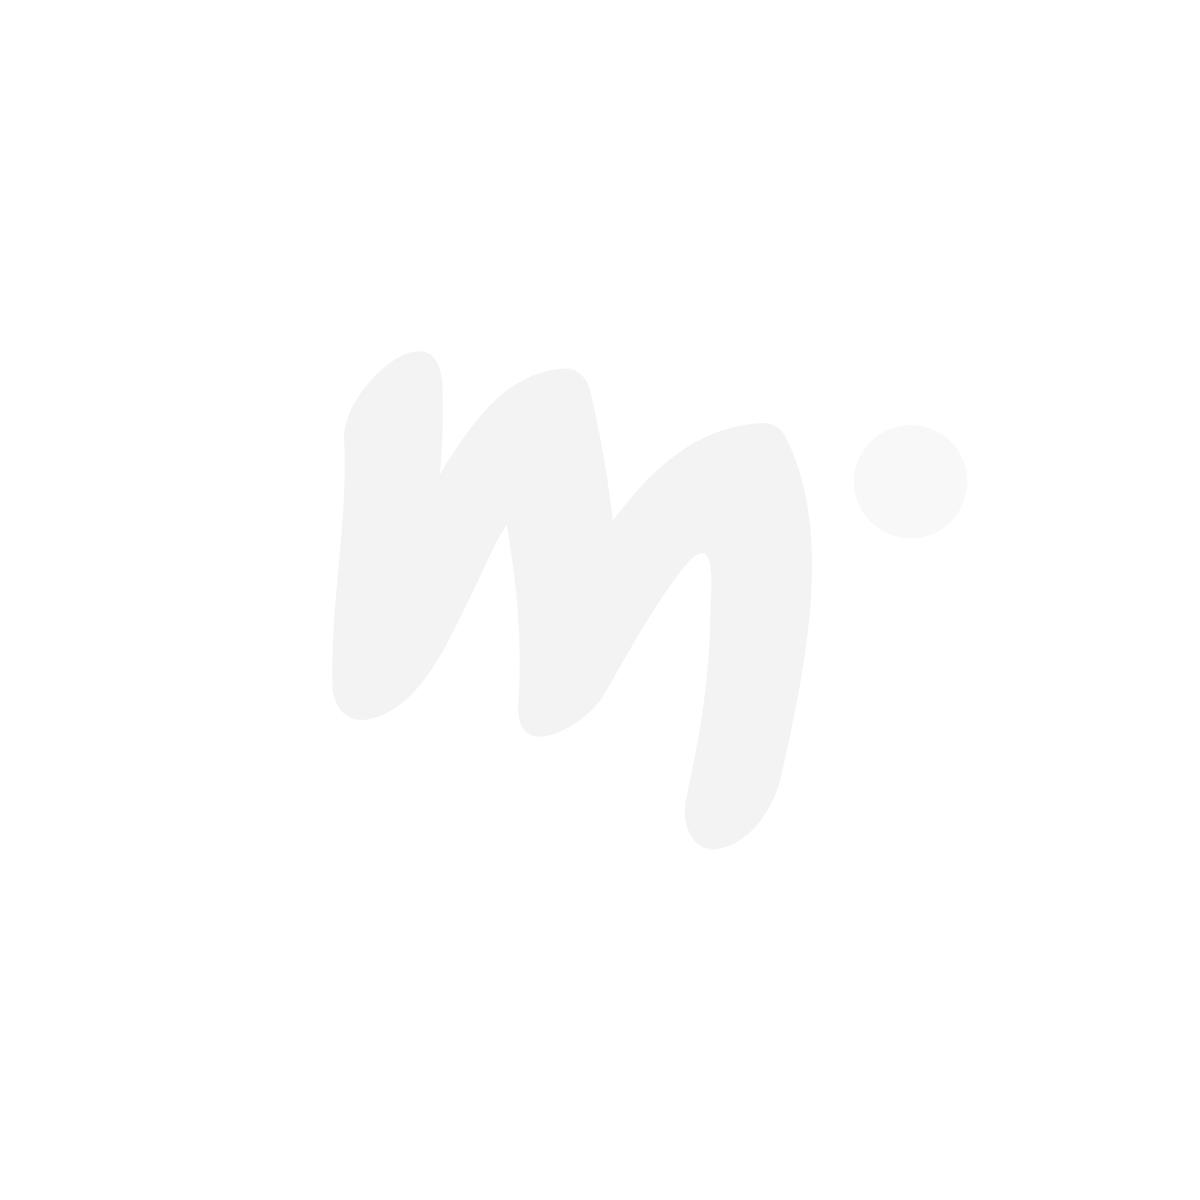 Peppi Pitkätossu Huvikummussa-pussilakanasetti